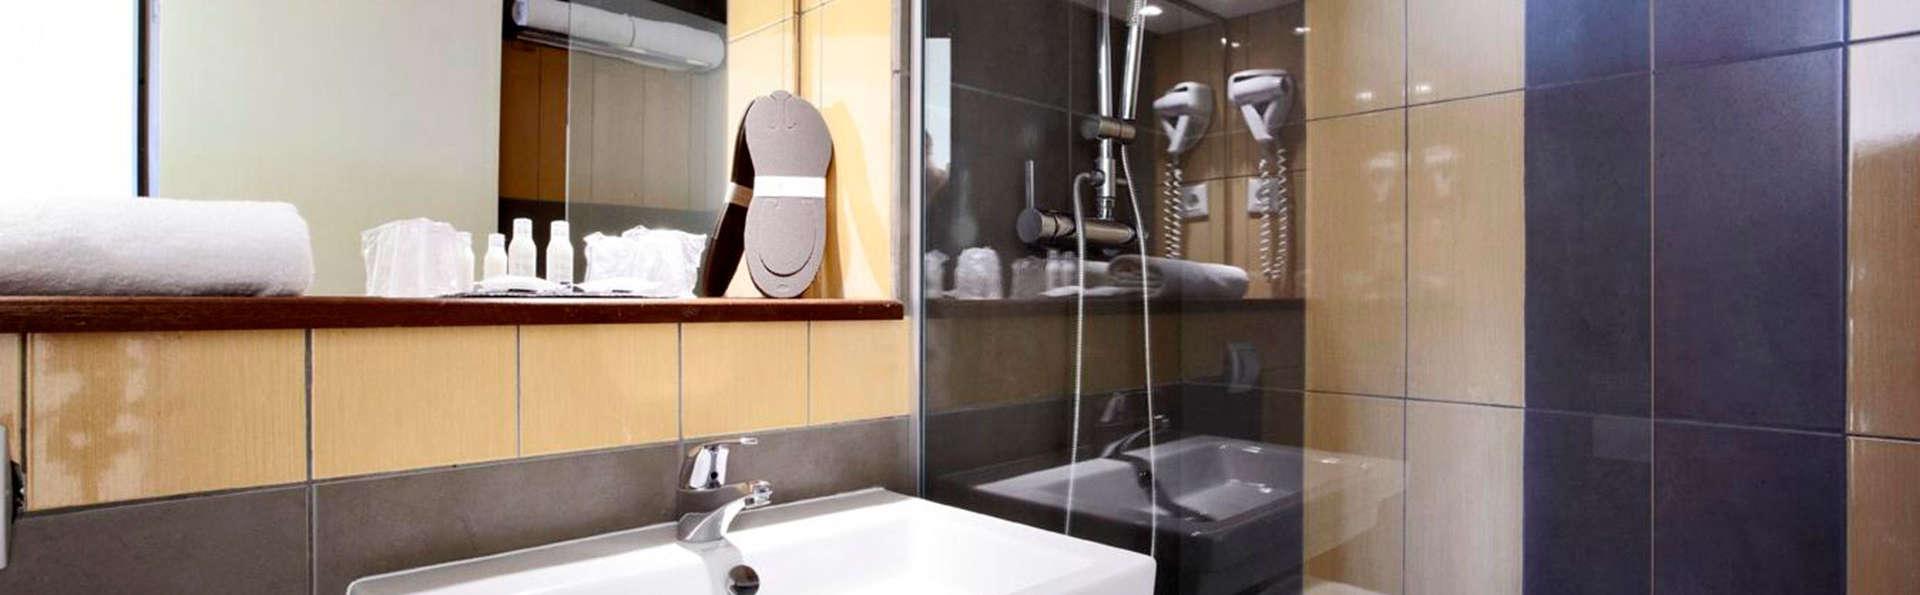 Hôtel Kyriad Montélimar - EDIT_bath.jpg